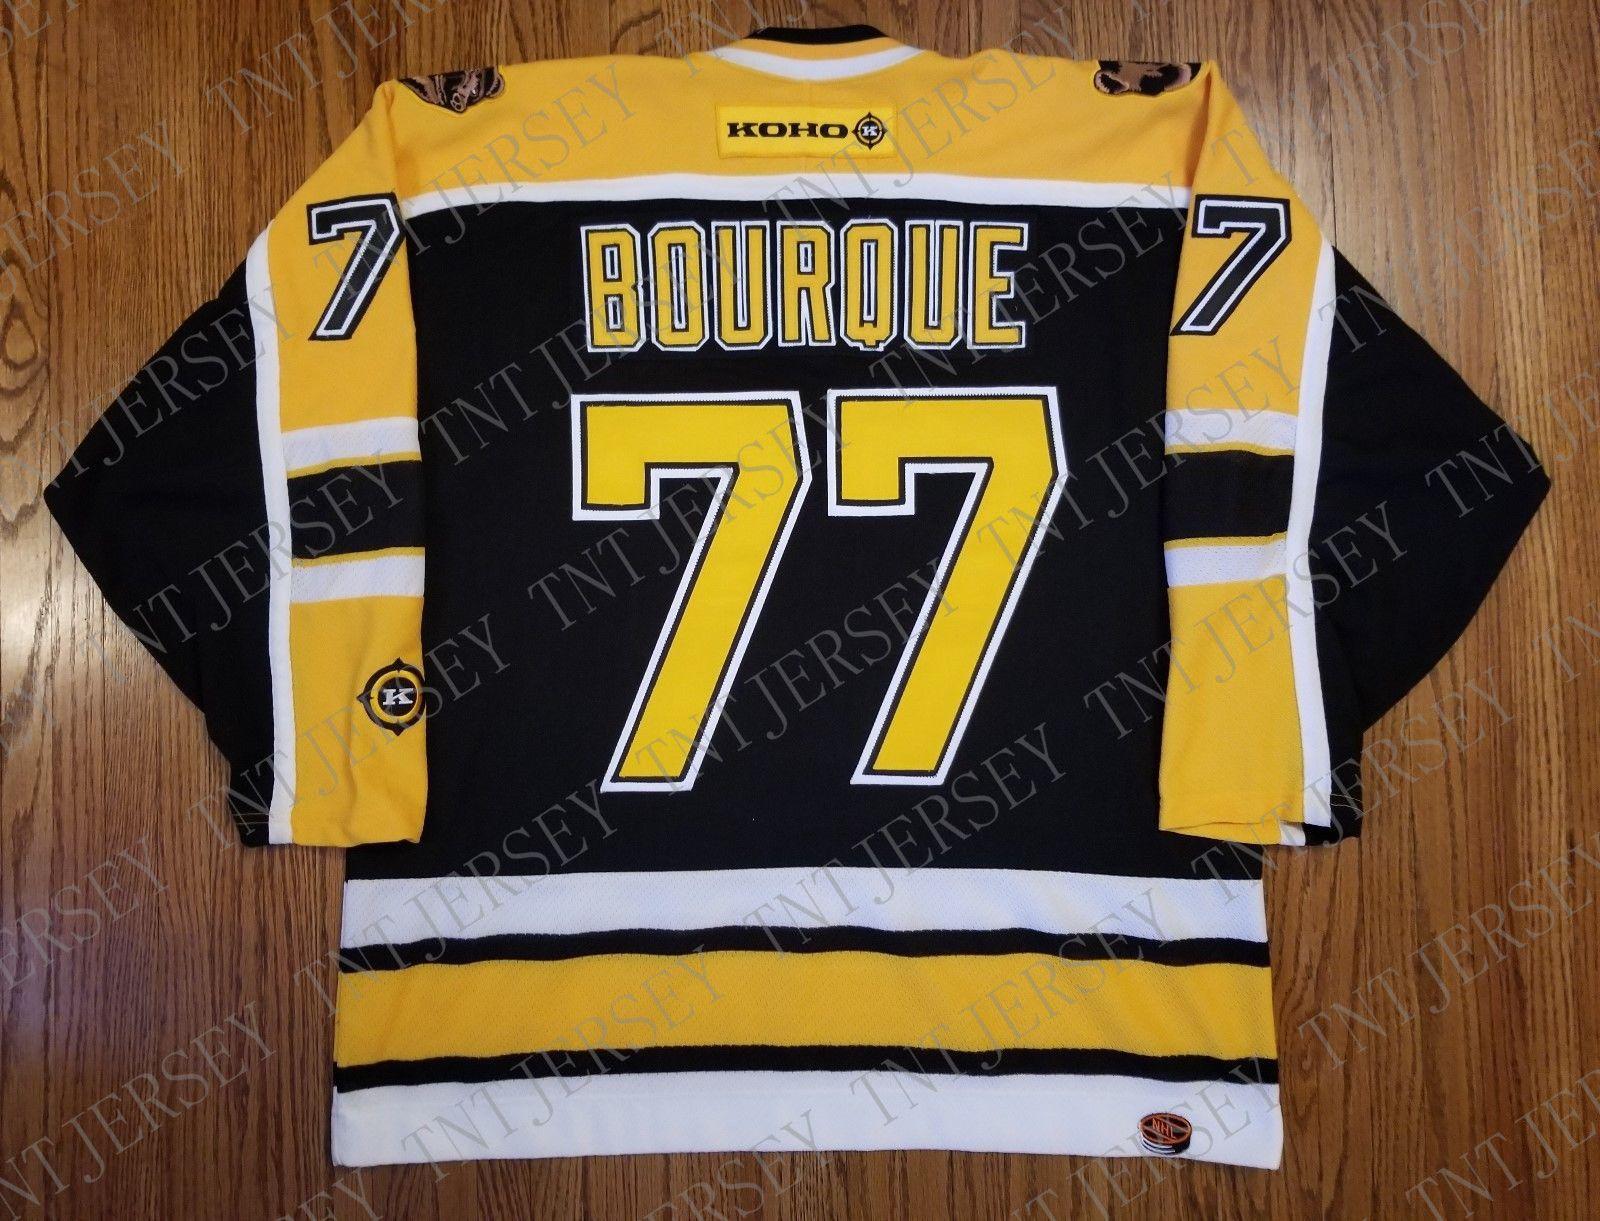 8e031496 2019 Cheap Custom Ray Bourque Vintage Koho Boston Bruins Jersey Black  Stitched Retro Hockey Jersey XS 5XL From Tntjersey, $30.46   DHgate.Com